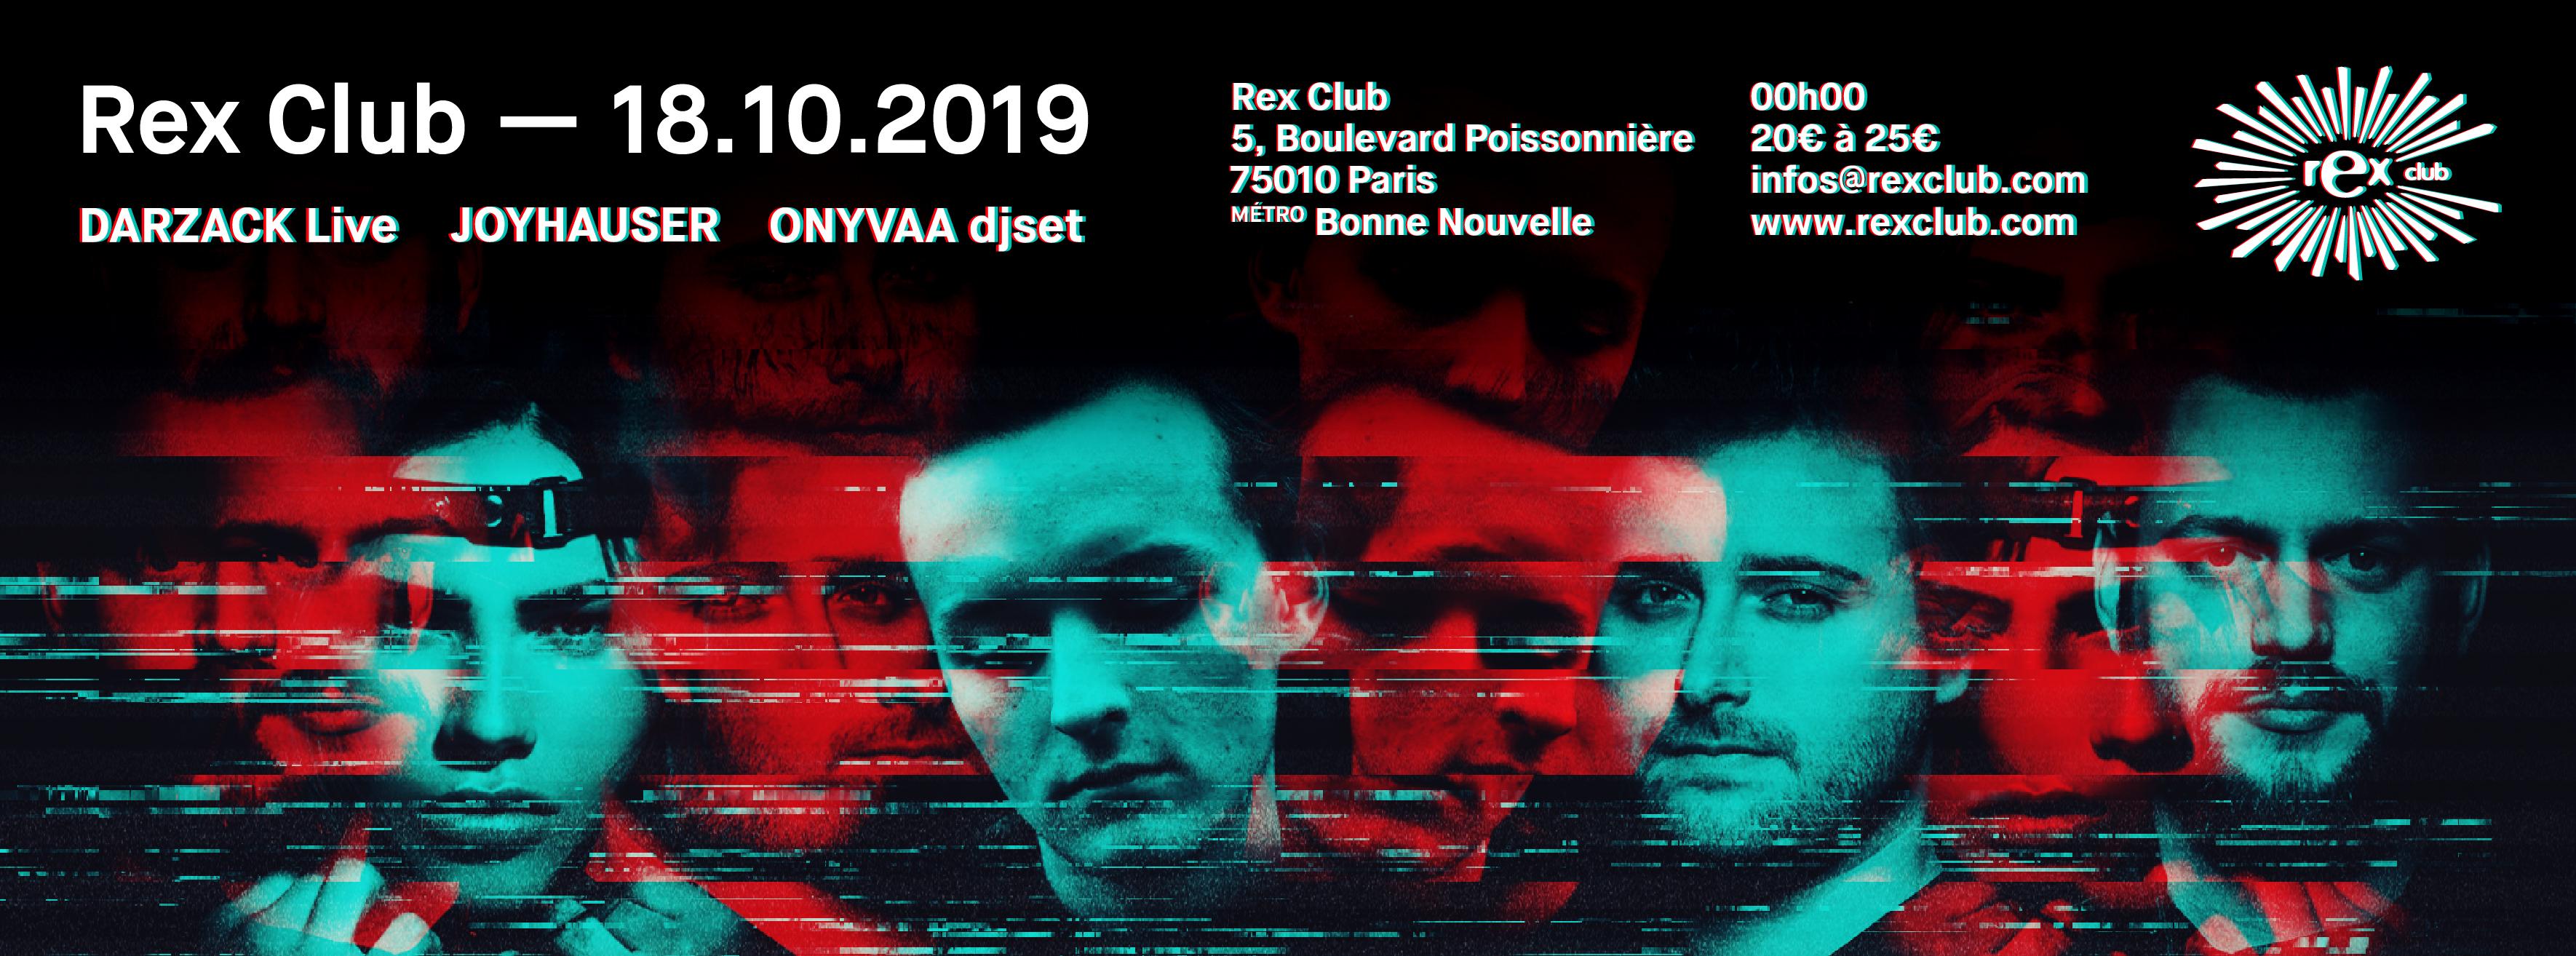 Rex Club presente: Darzack Live, Joyhauser, Onyvaa